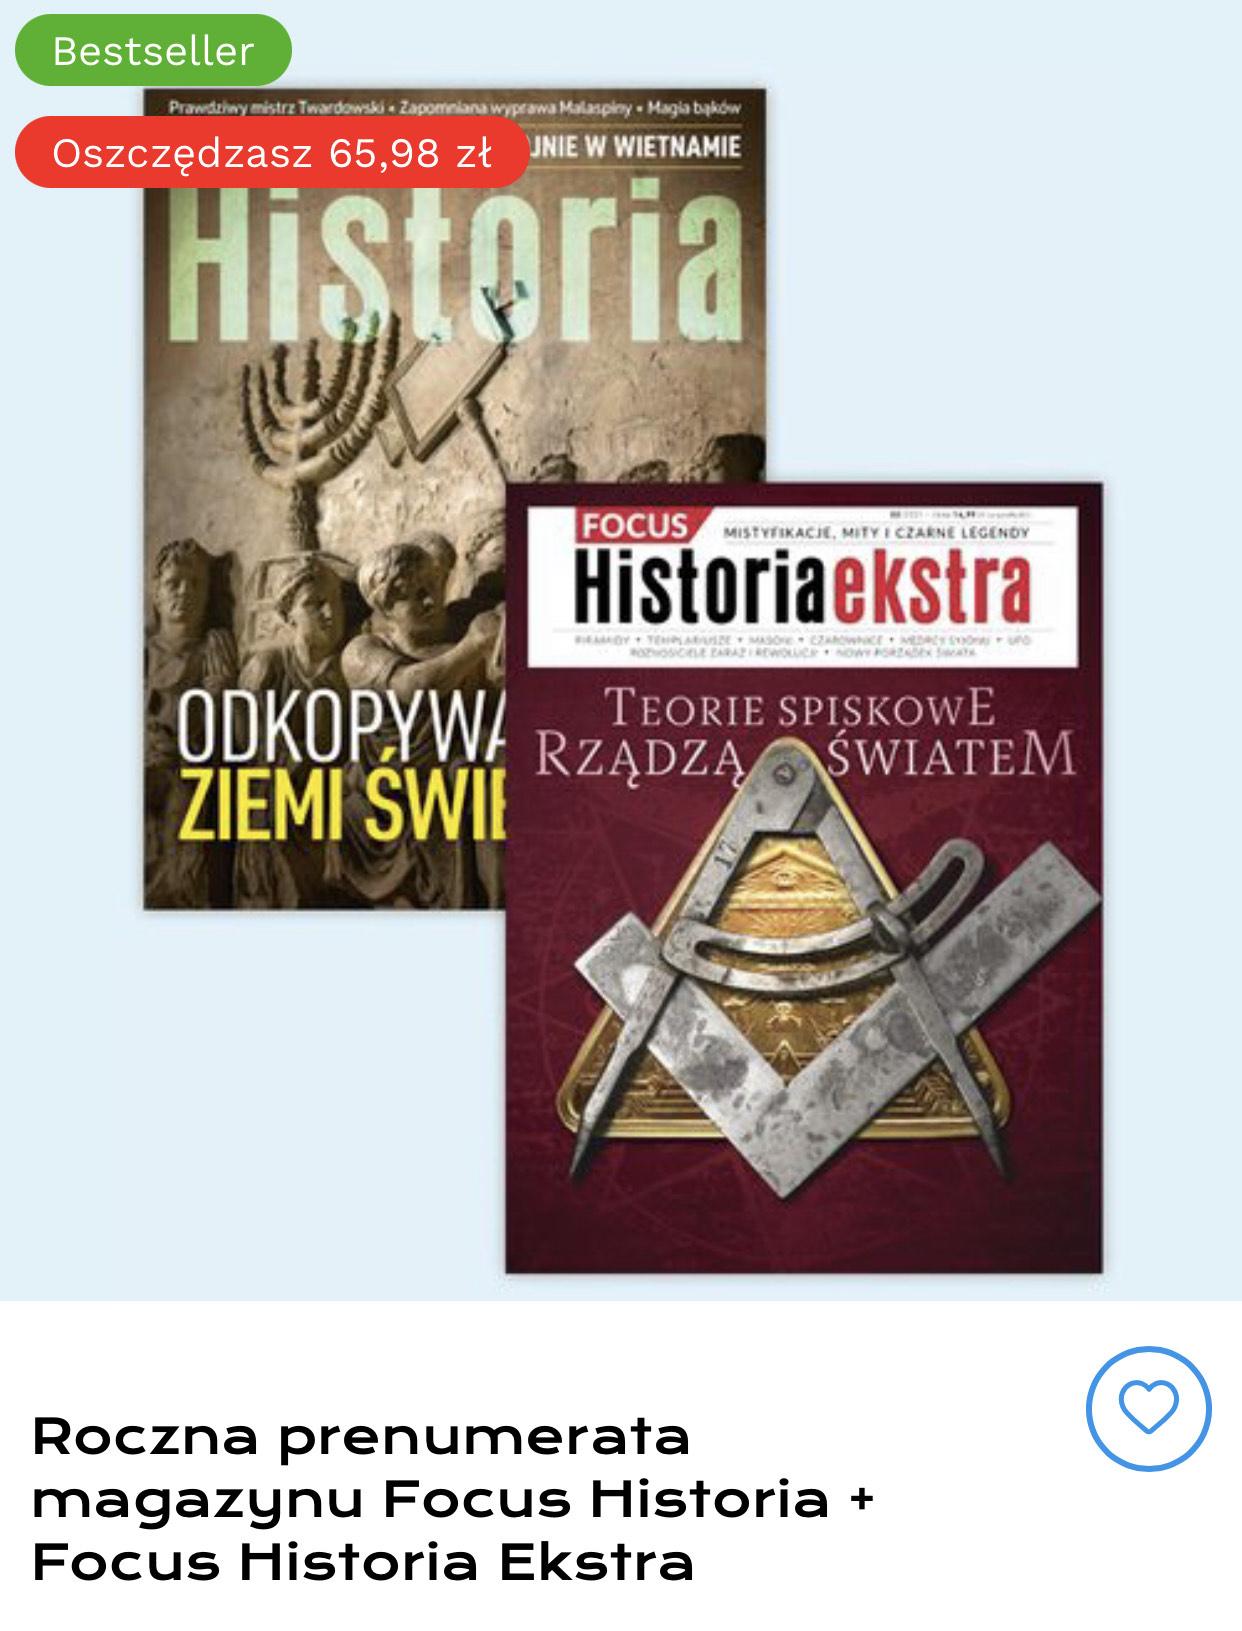 Roczna prenumerata magazynu Focus Historia + Focus Historia Ekstra